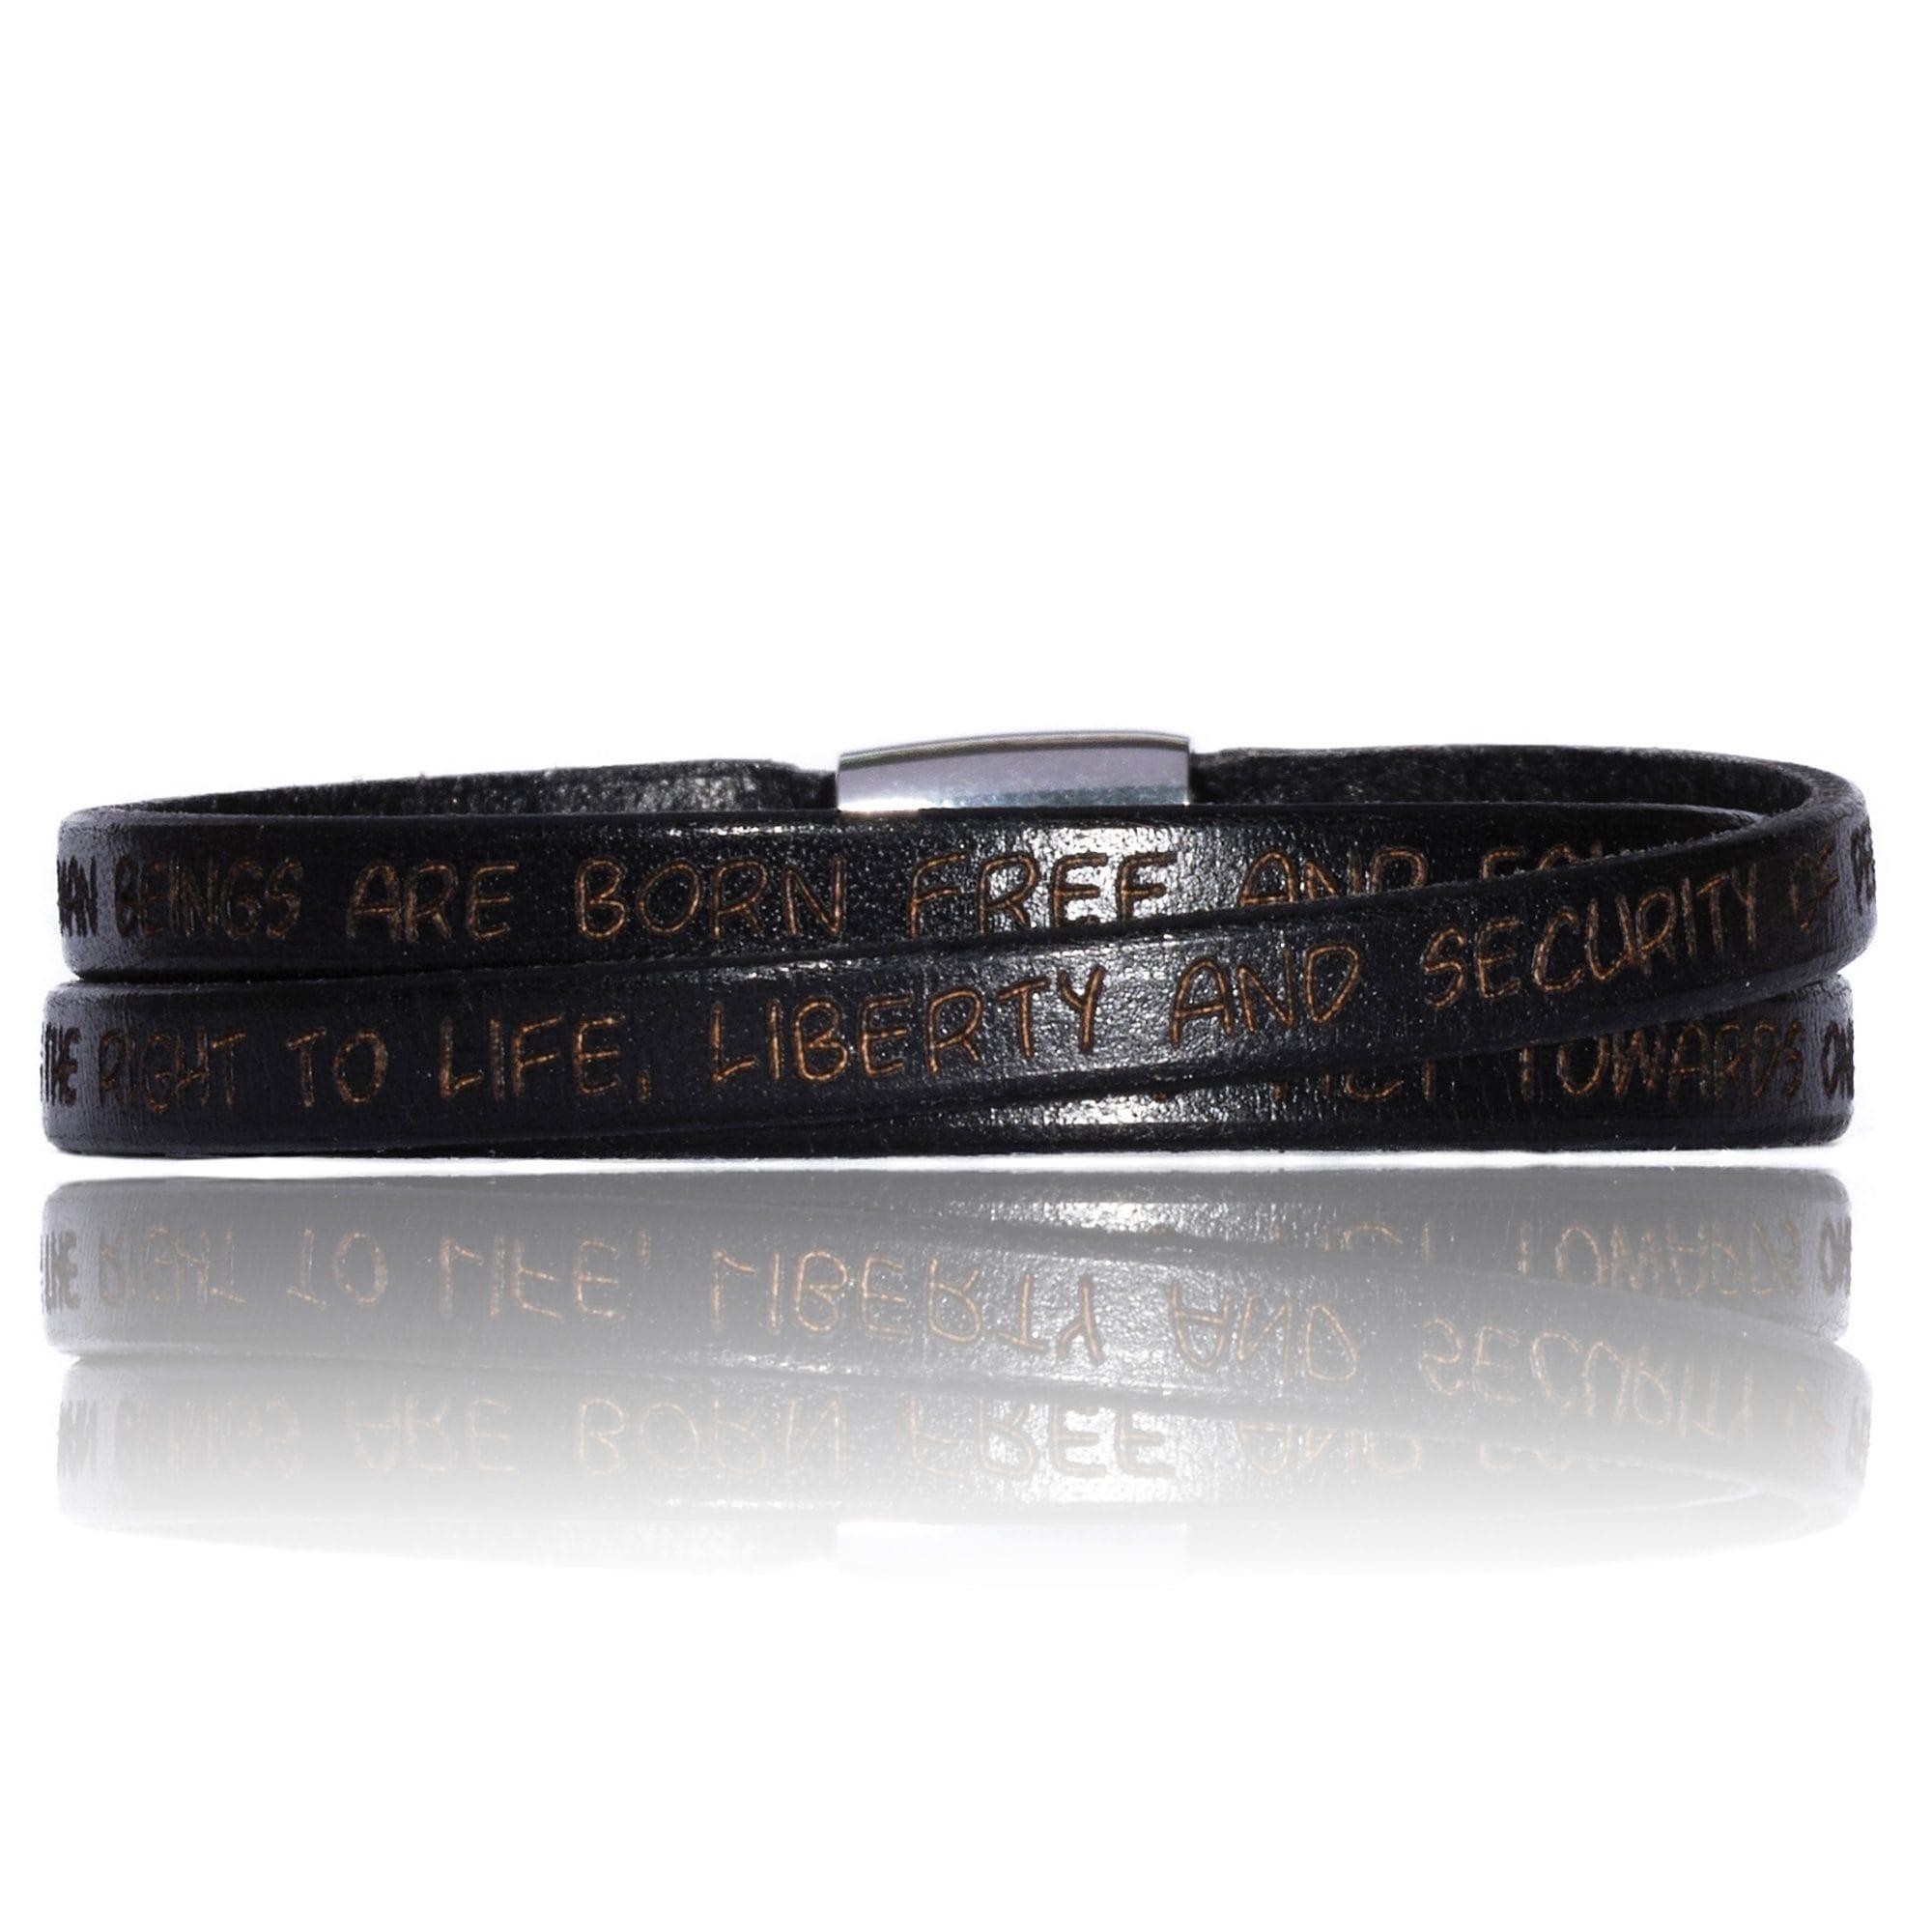 Gilardy Armband Edelstahl Leder | Schmuck > Armbänder | Schwarz | Leder | Gilardy